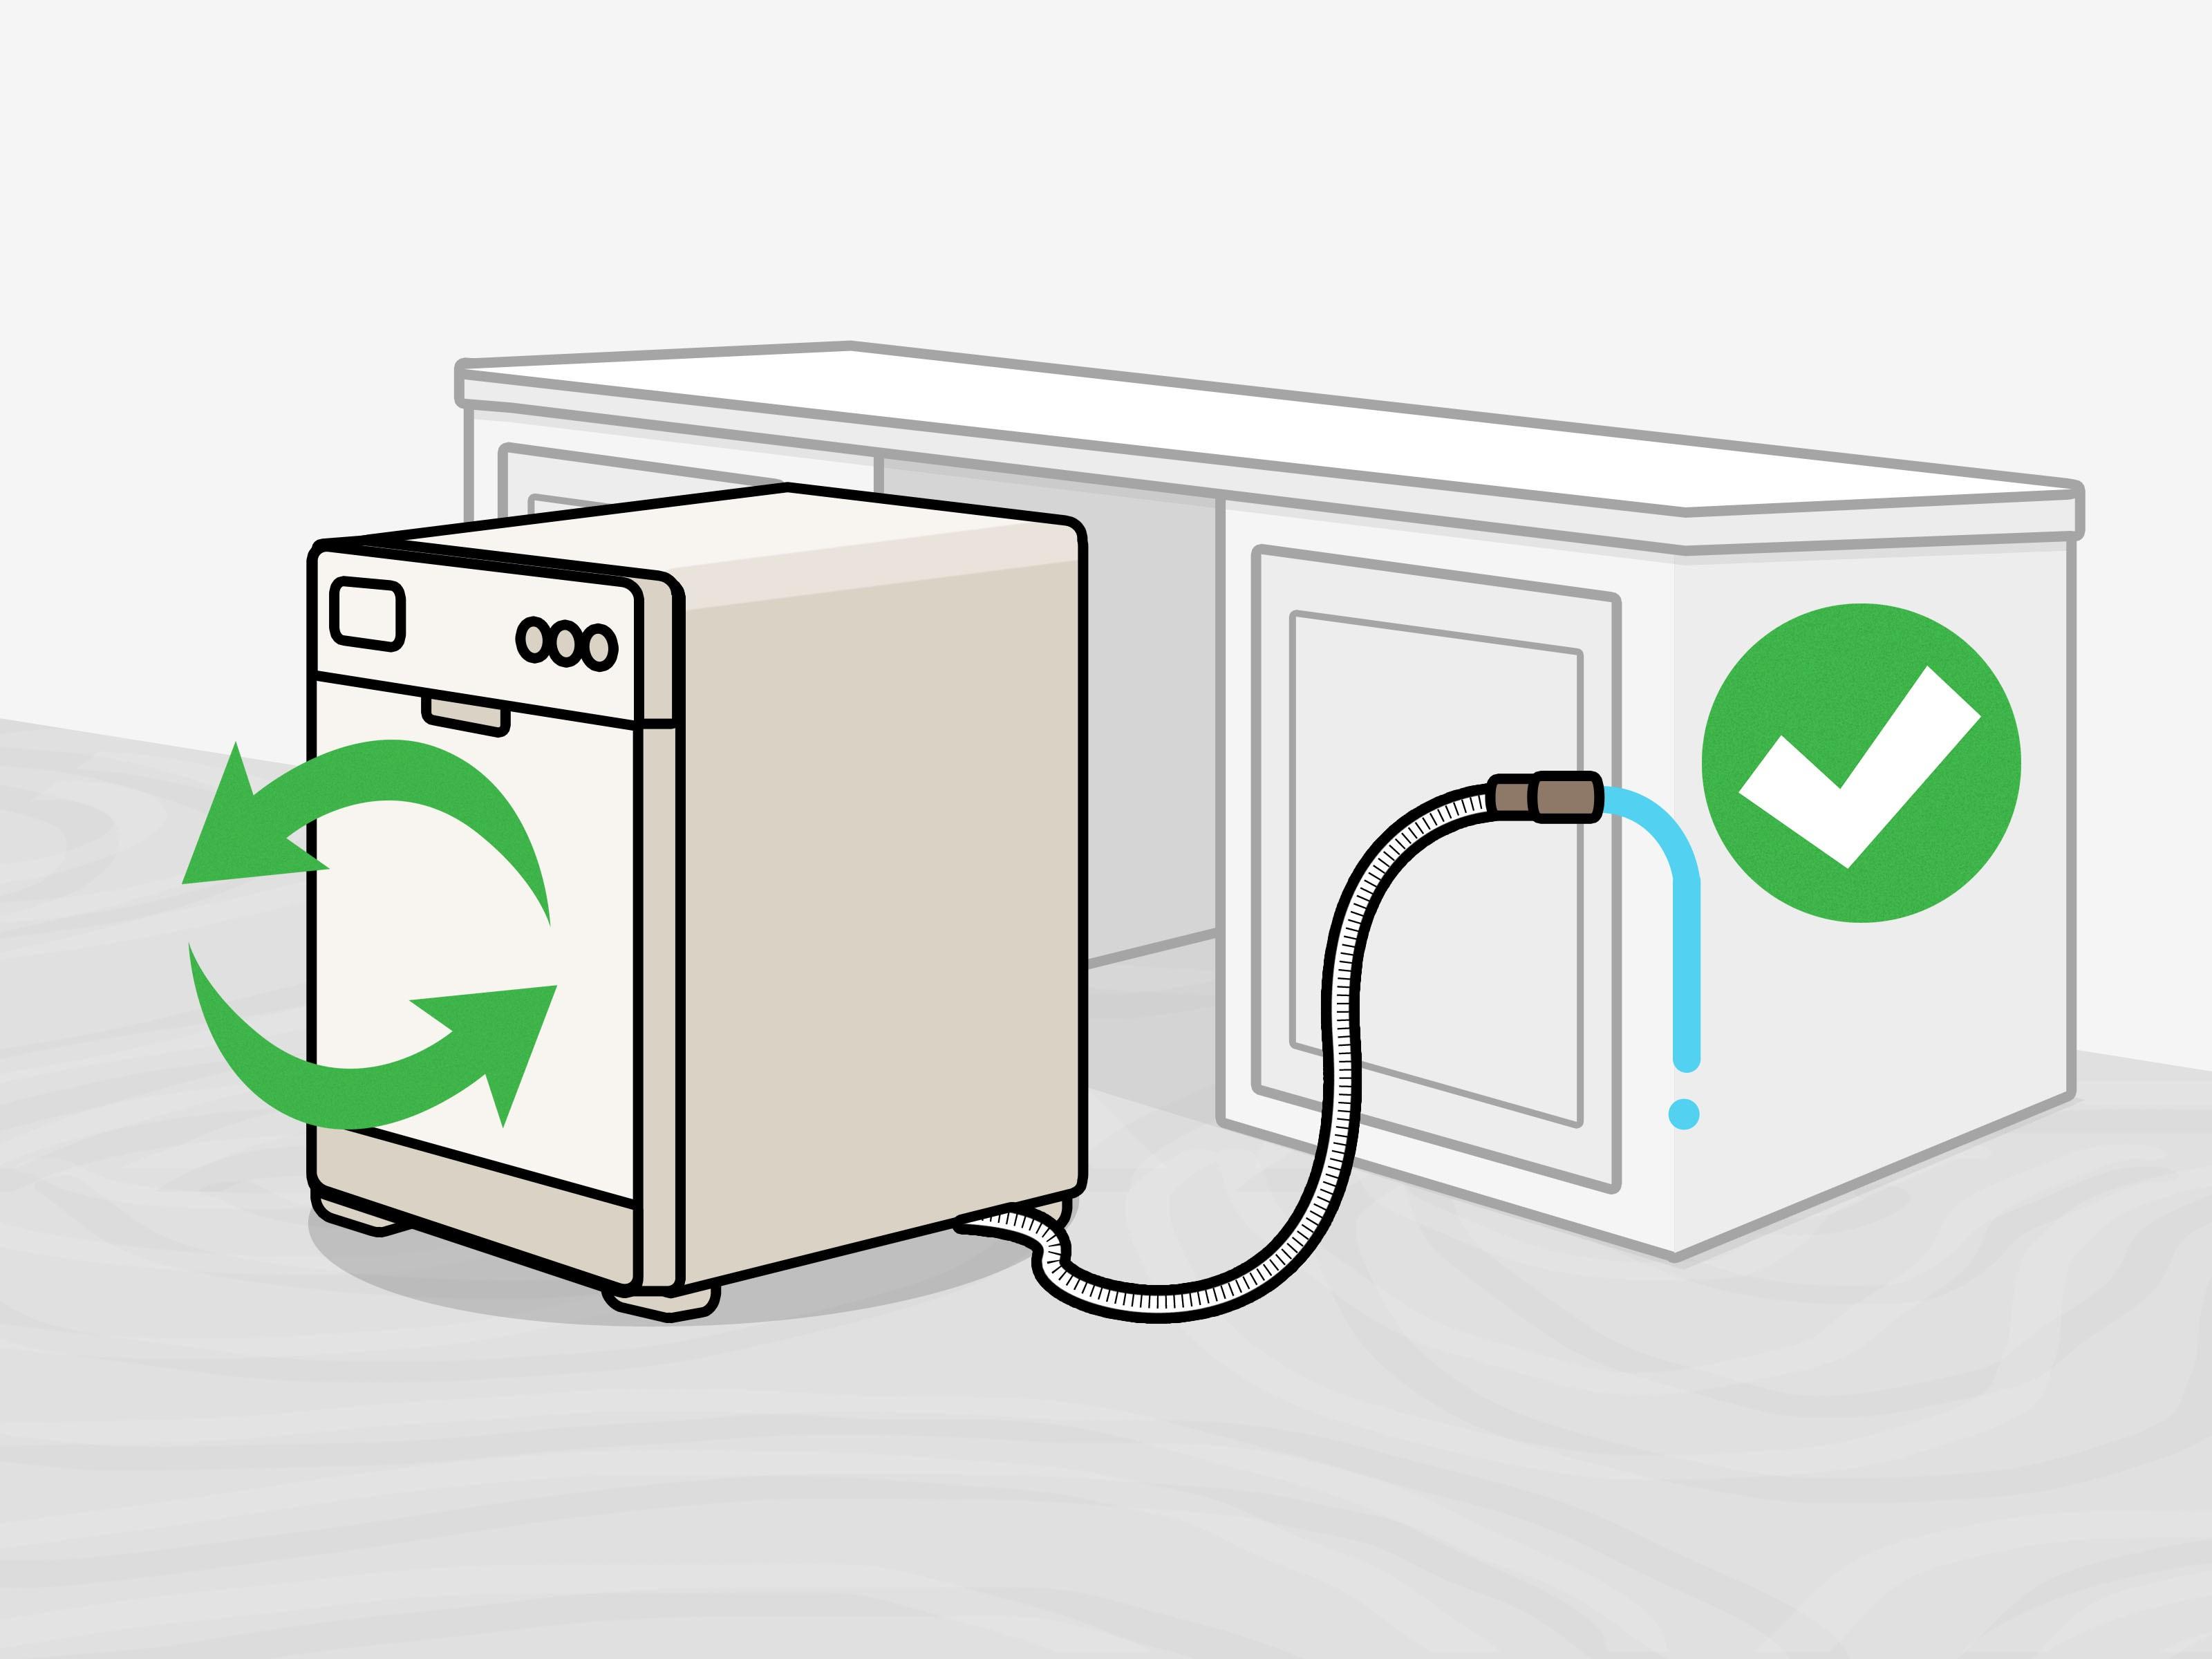 Asko Dishwasher Parts Diagram 2 Easy Ways to Drain A Dishwasher with Wikihow Of Asko Dishwasher Parts Diagram